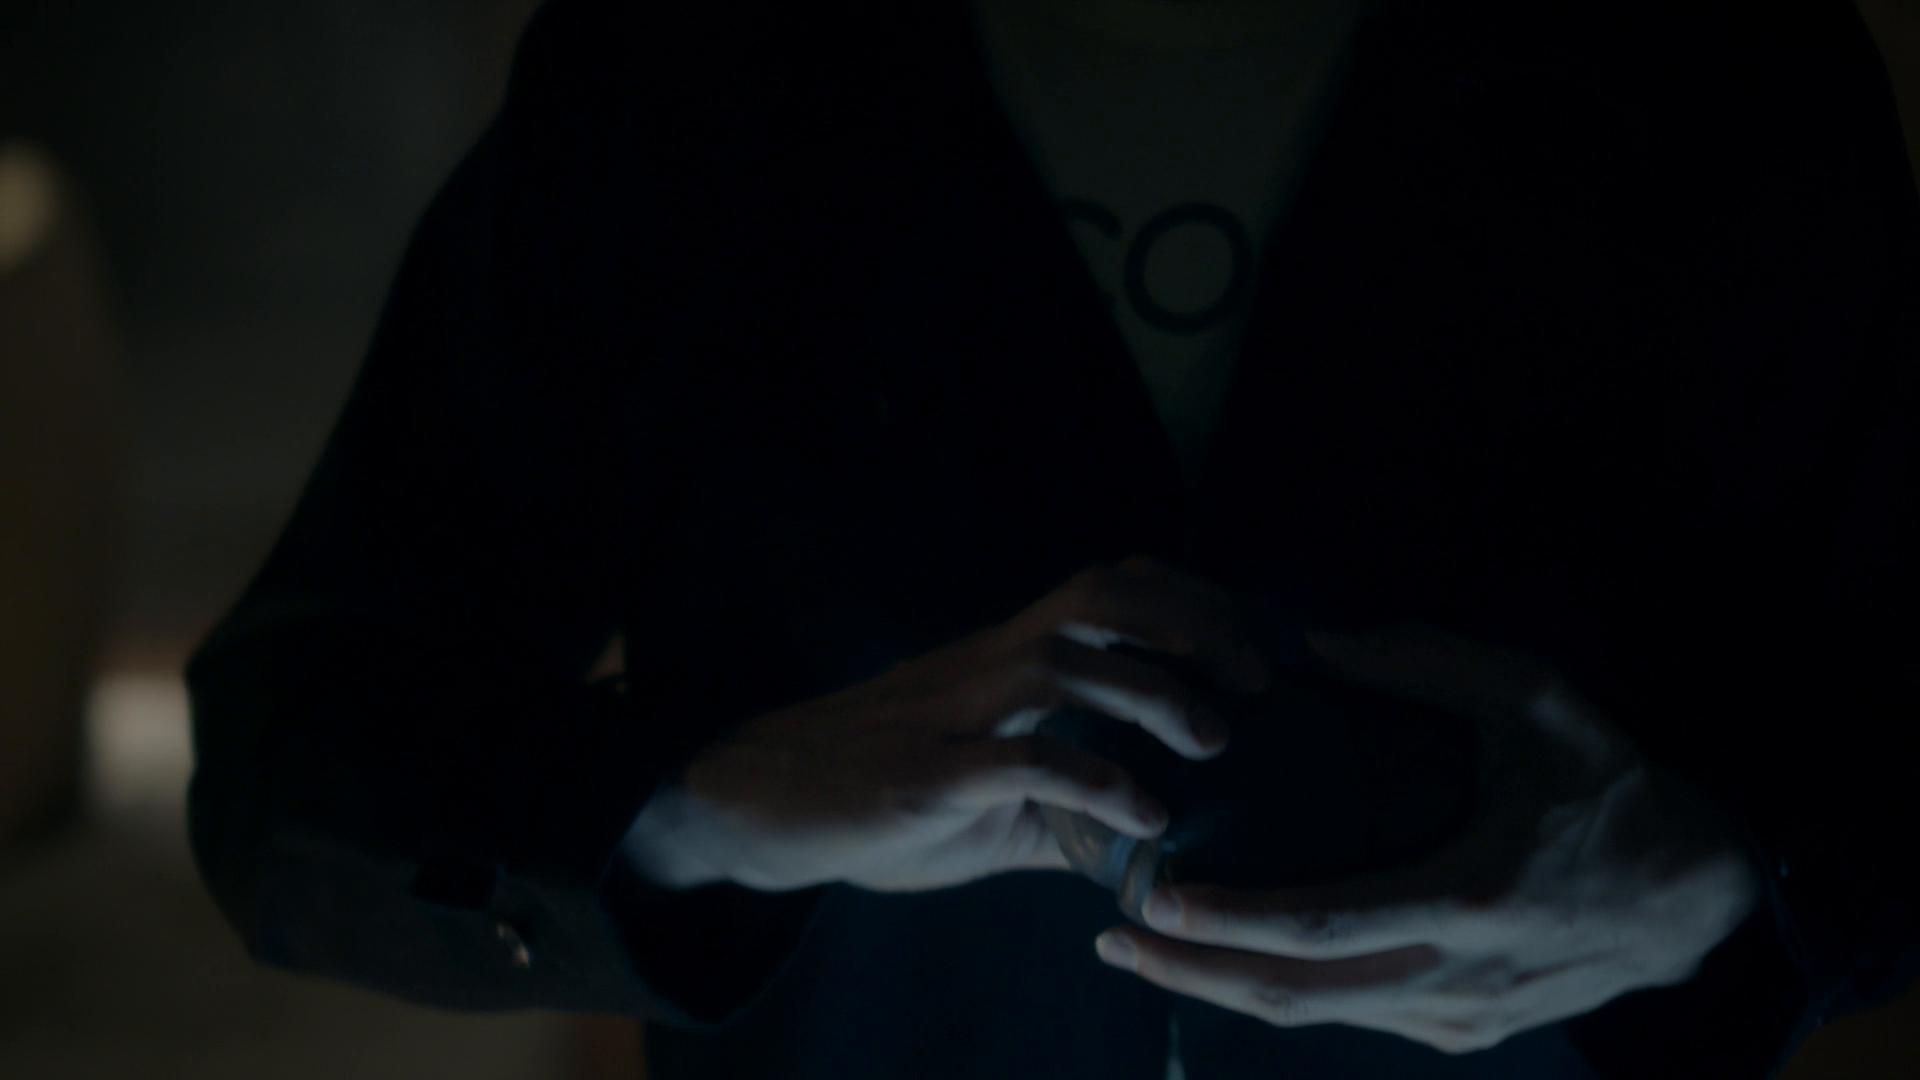 The Magicians 2015 S04E04 Marry Fuck Kill 1080p AMZN WEB-DL DDP5 1 H 264-NTG